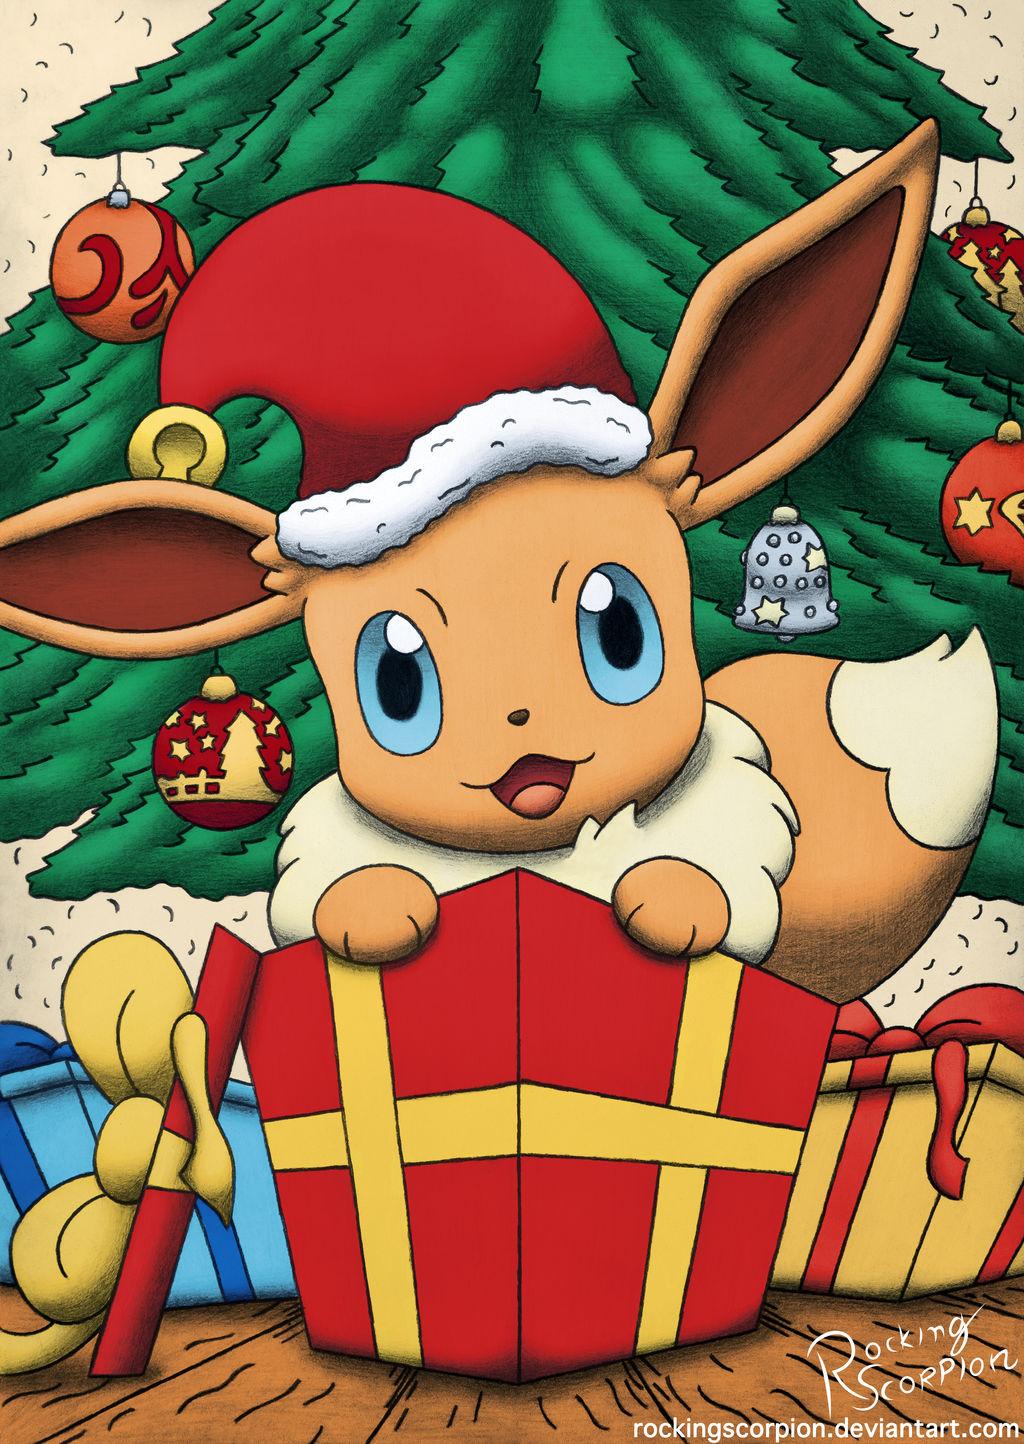 Christmas Eevee.It S Christmas Eevee By Rockingscorpion On Deviantart